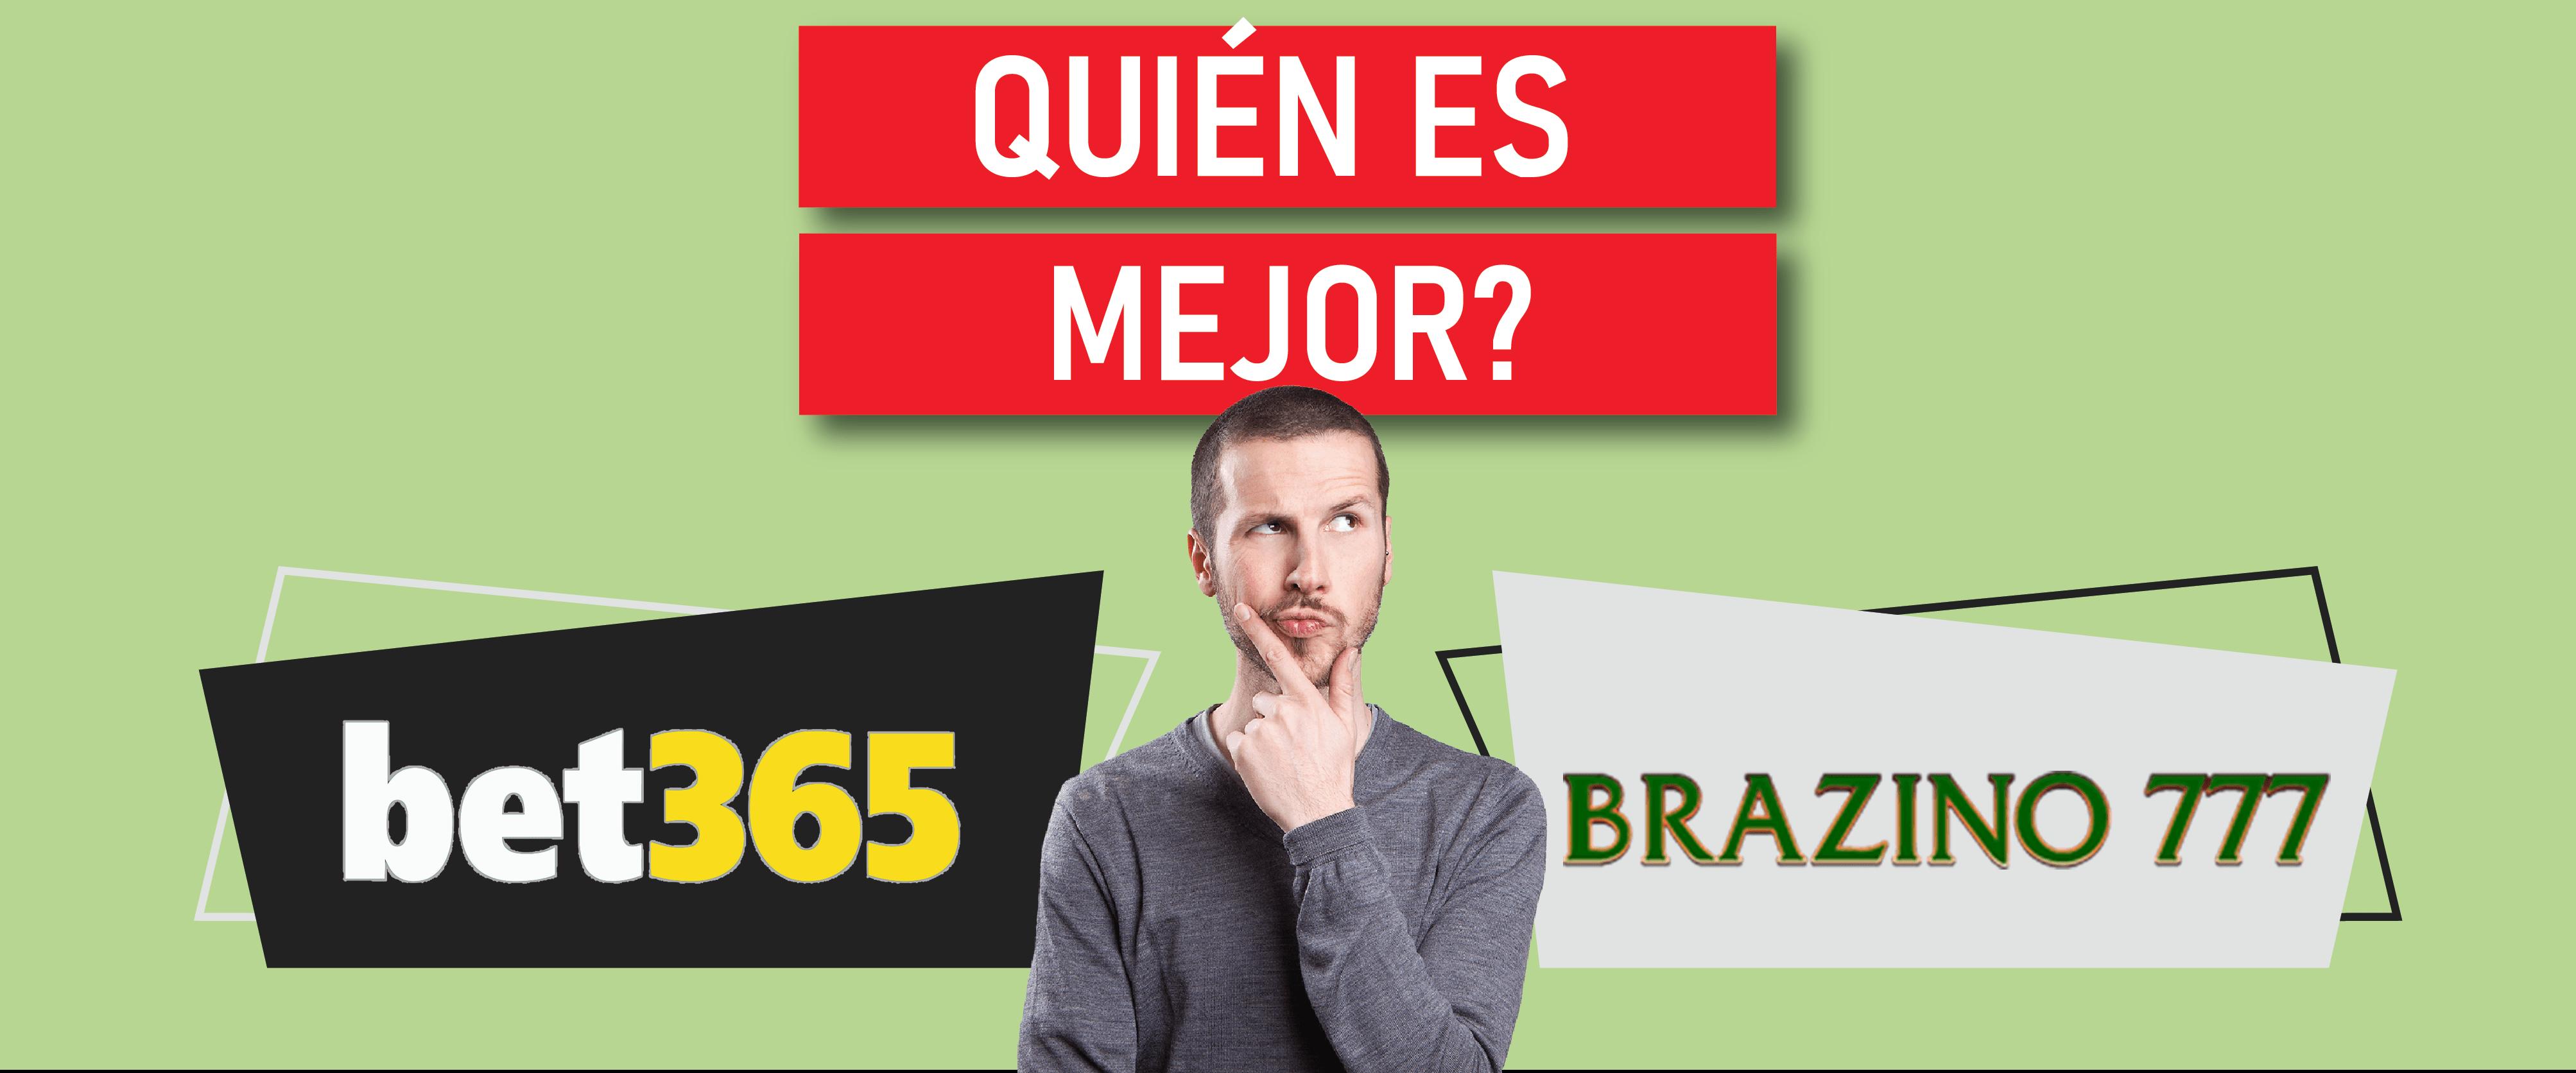 bet365 y brazino777